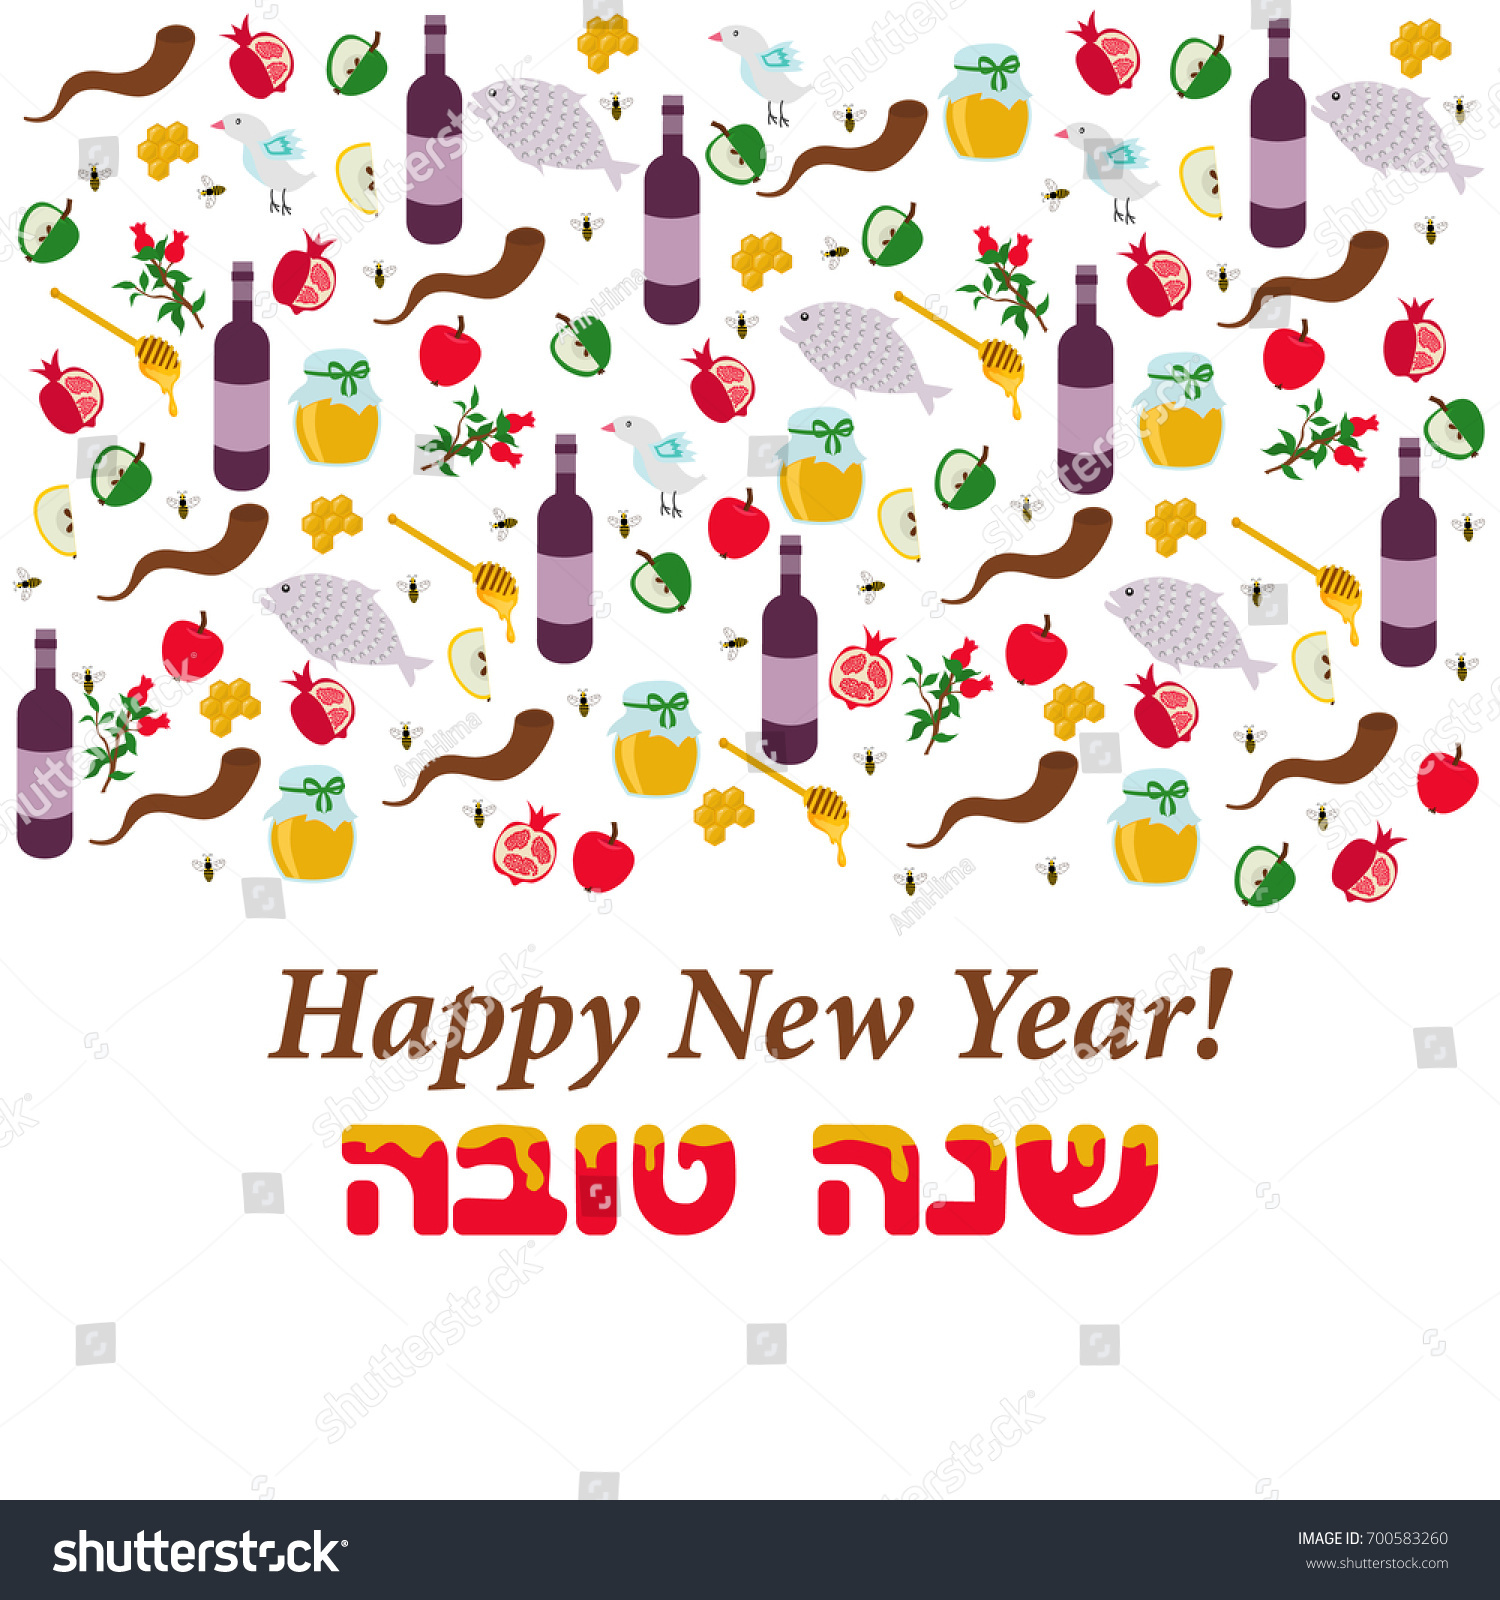 Greeting card jewish new year traditional stock vector 700583260 greeting card for jewish new year with traditional elements of holiday rosh hashanah shana tova m4hsunfo